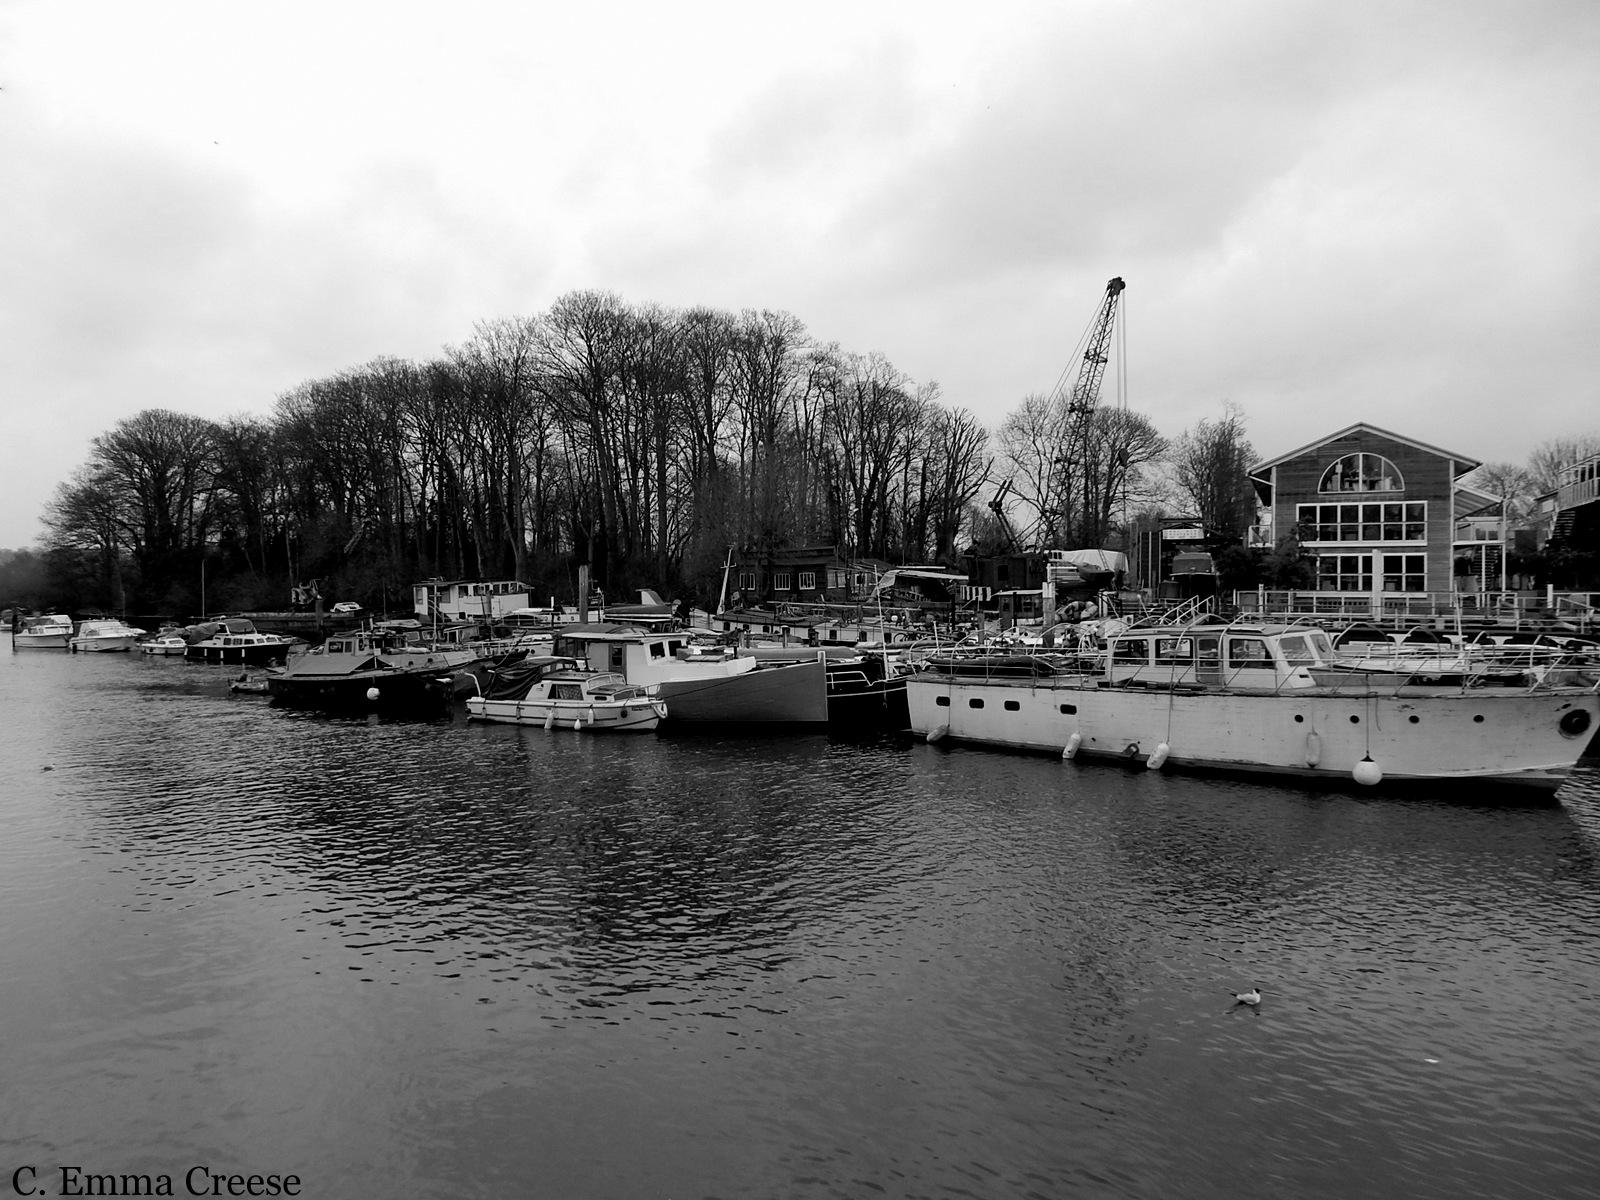 Richmond Twickenham Thames River